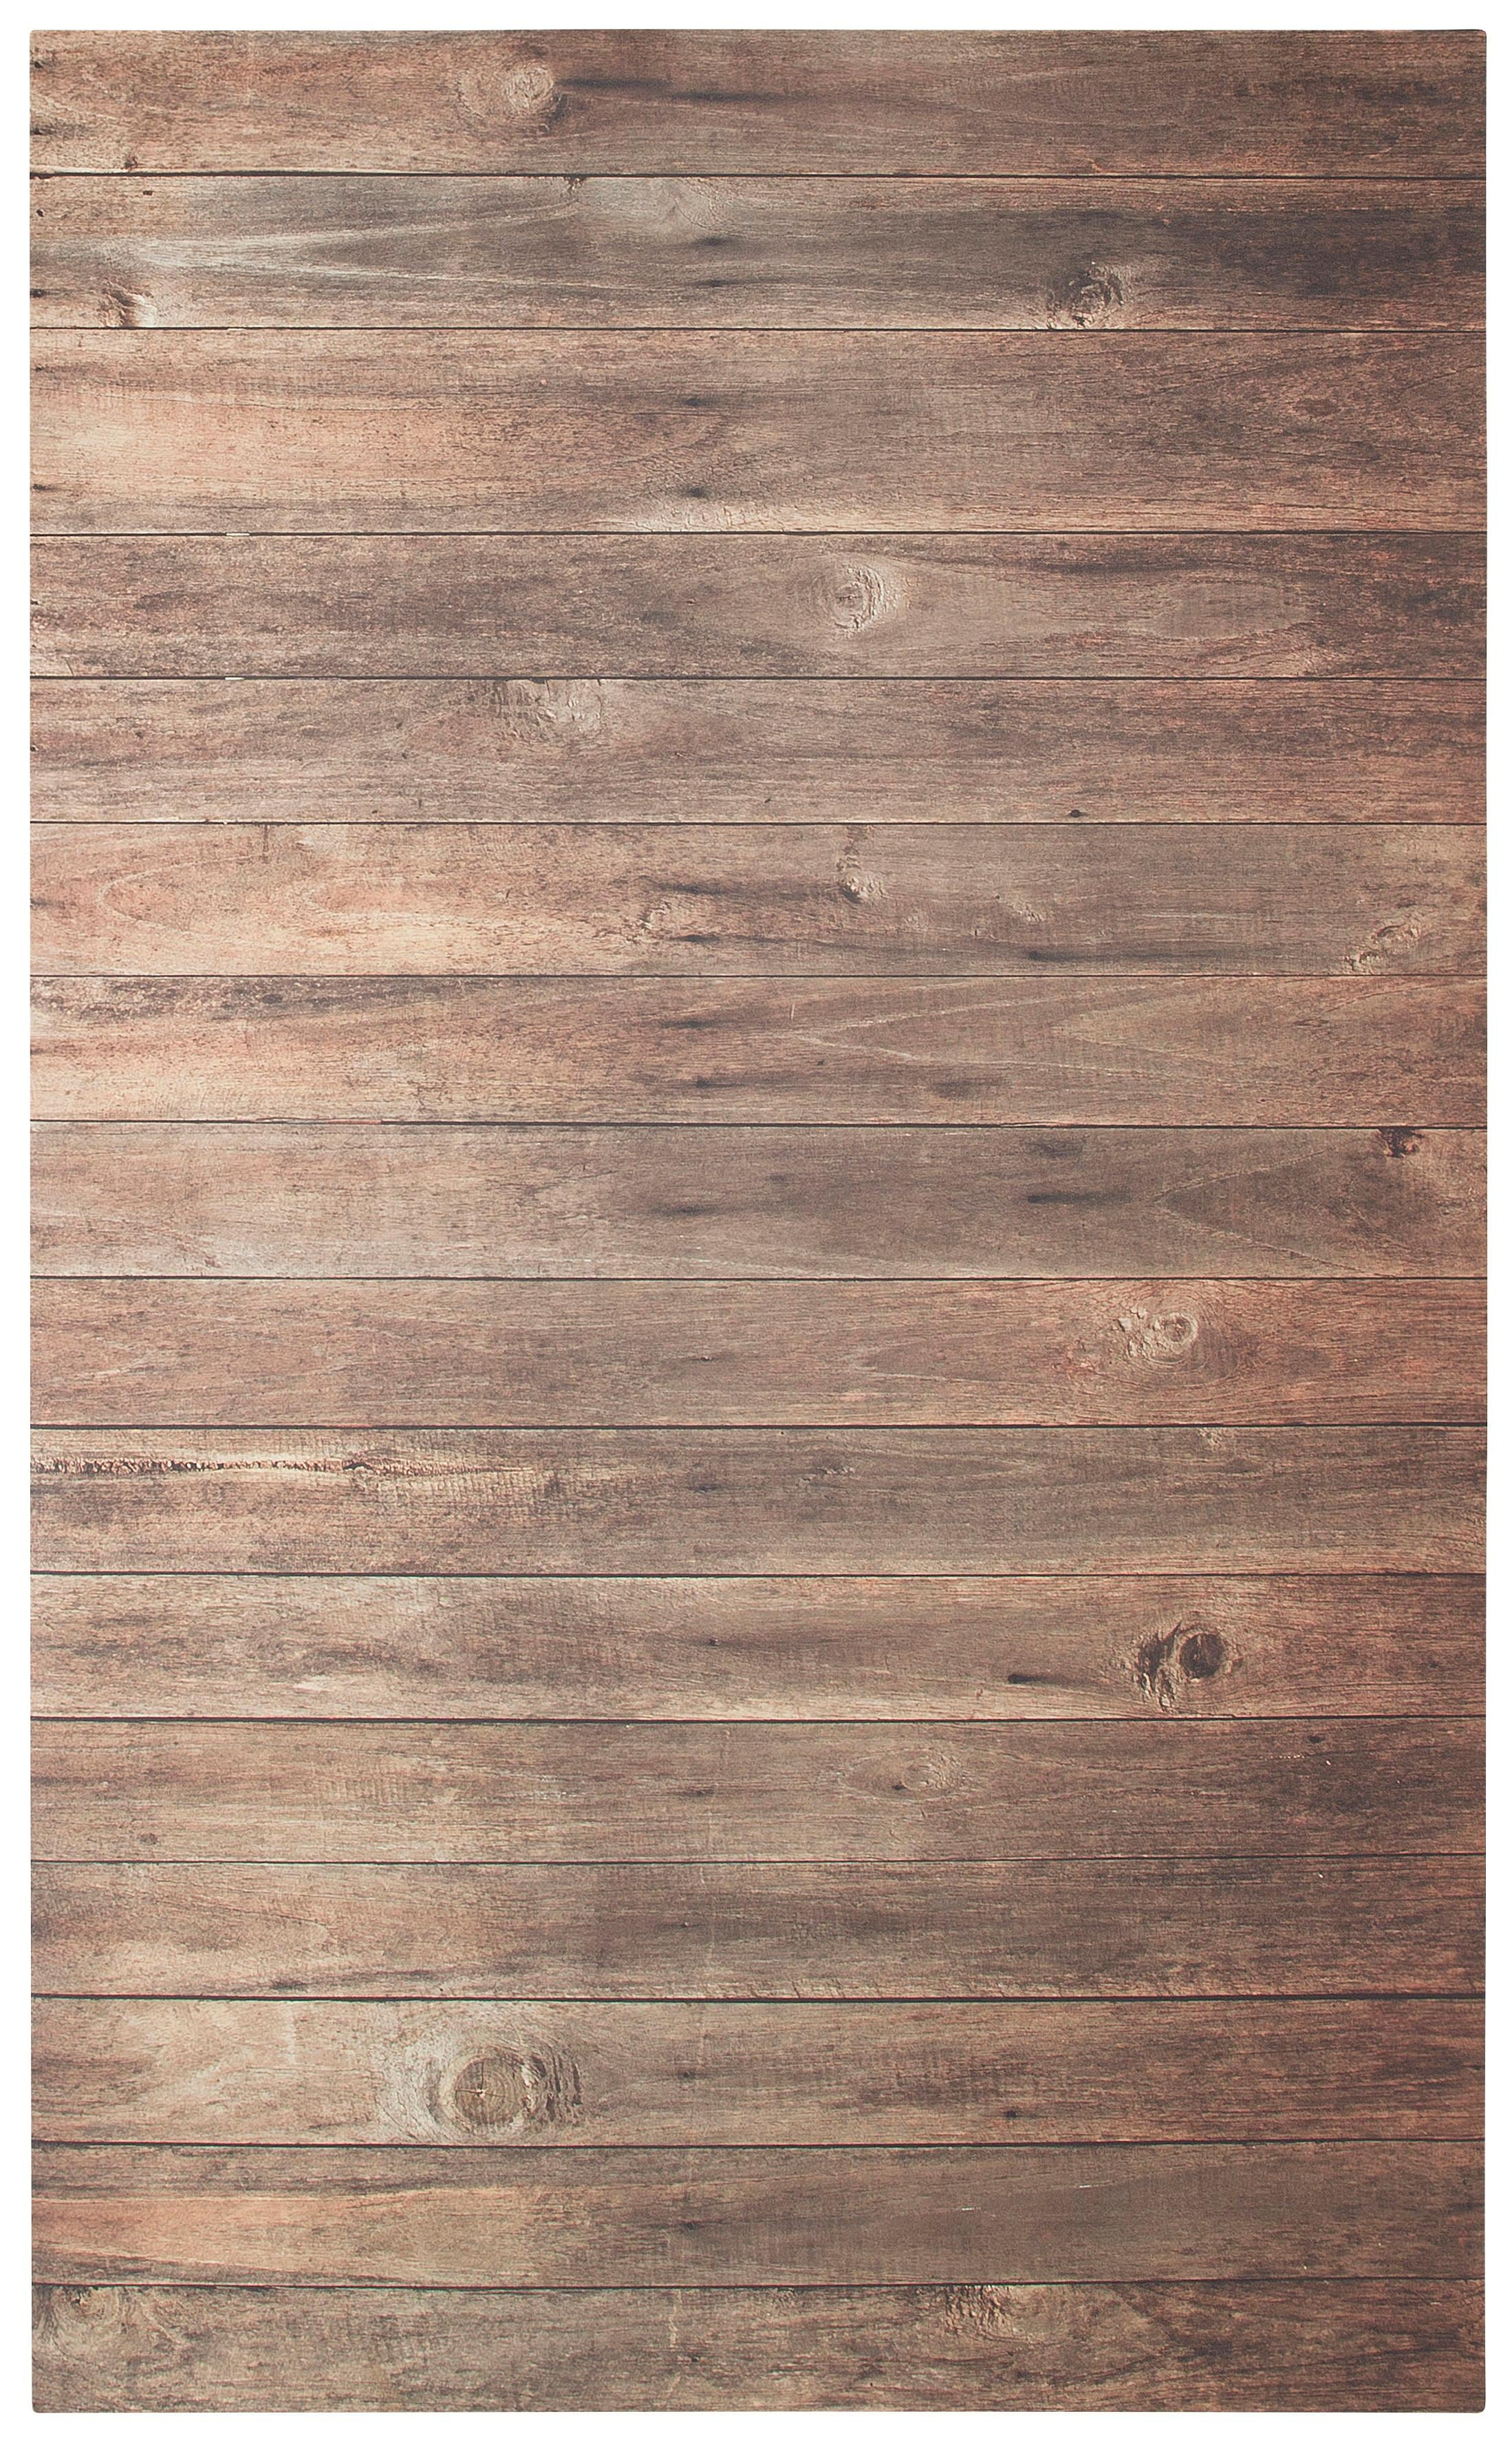 Vinylteppich Holz my home rechteckig Höhe 2 mm gedruckt